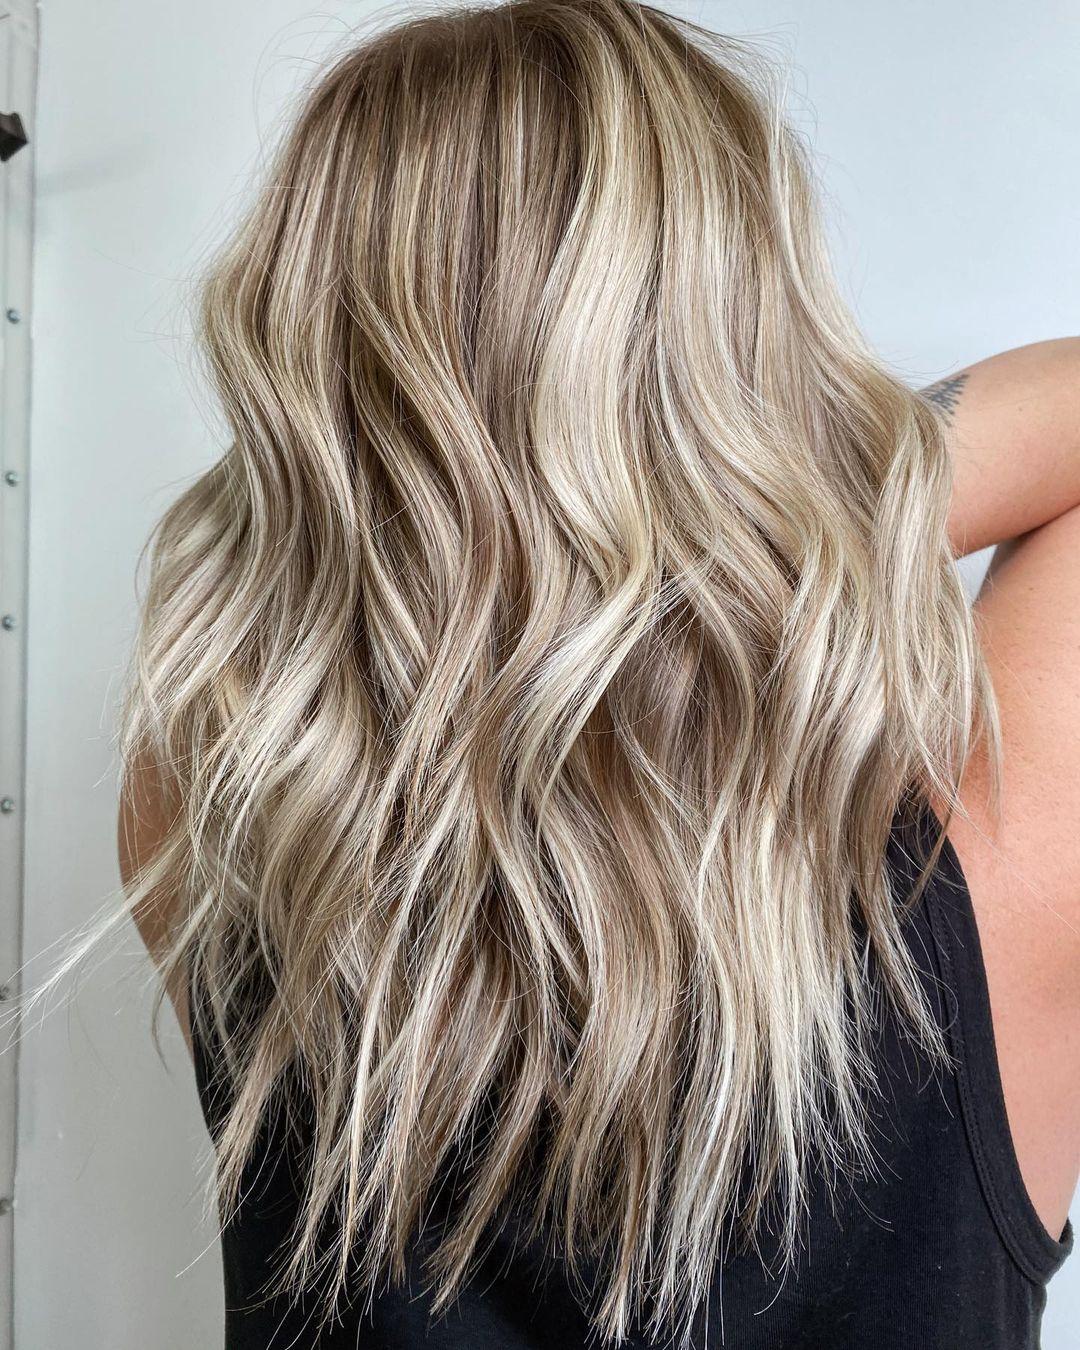 Long Layered Light Dirty Blonde Hair